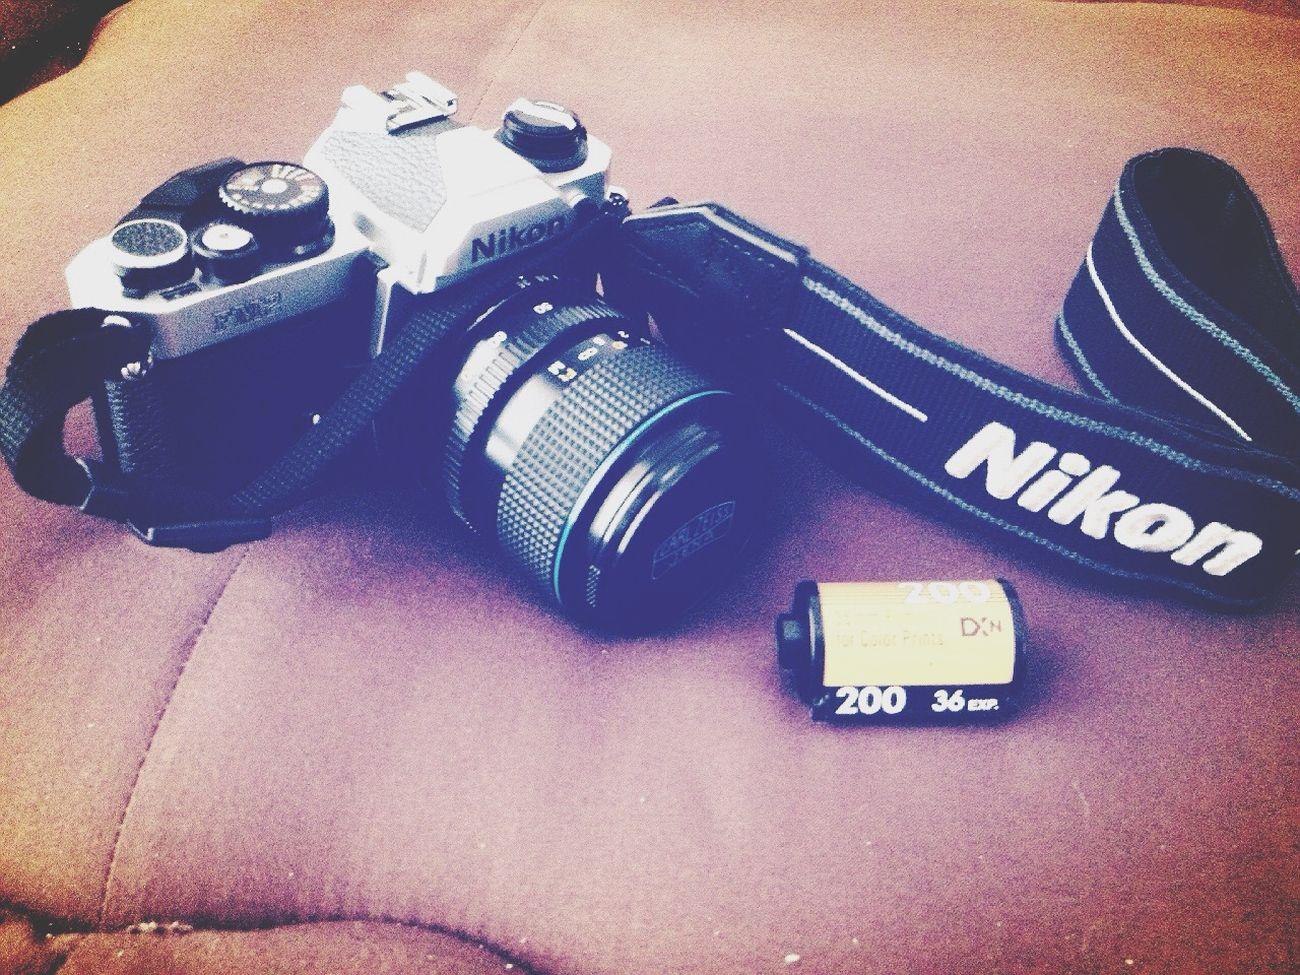 第一卷半結束,期待洗照片! Hello World Enjoying Life Everyday Education Photo Around Me About Me Nikon FM2/T